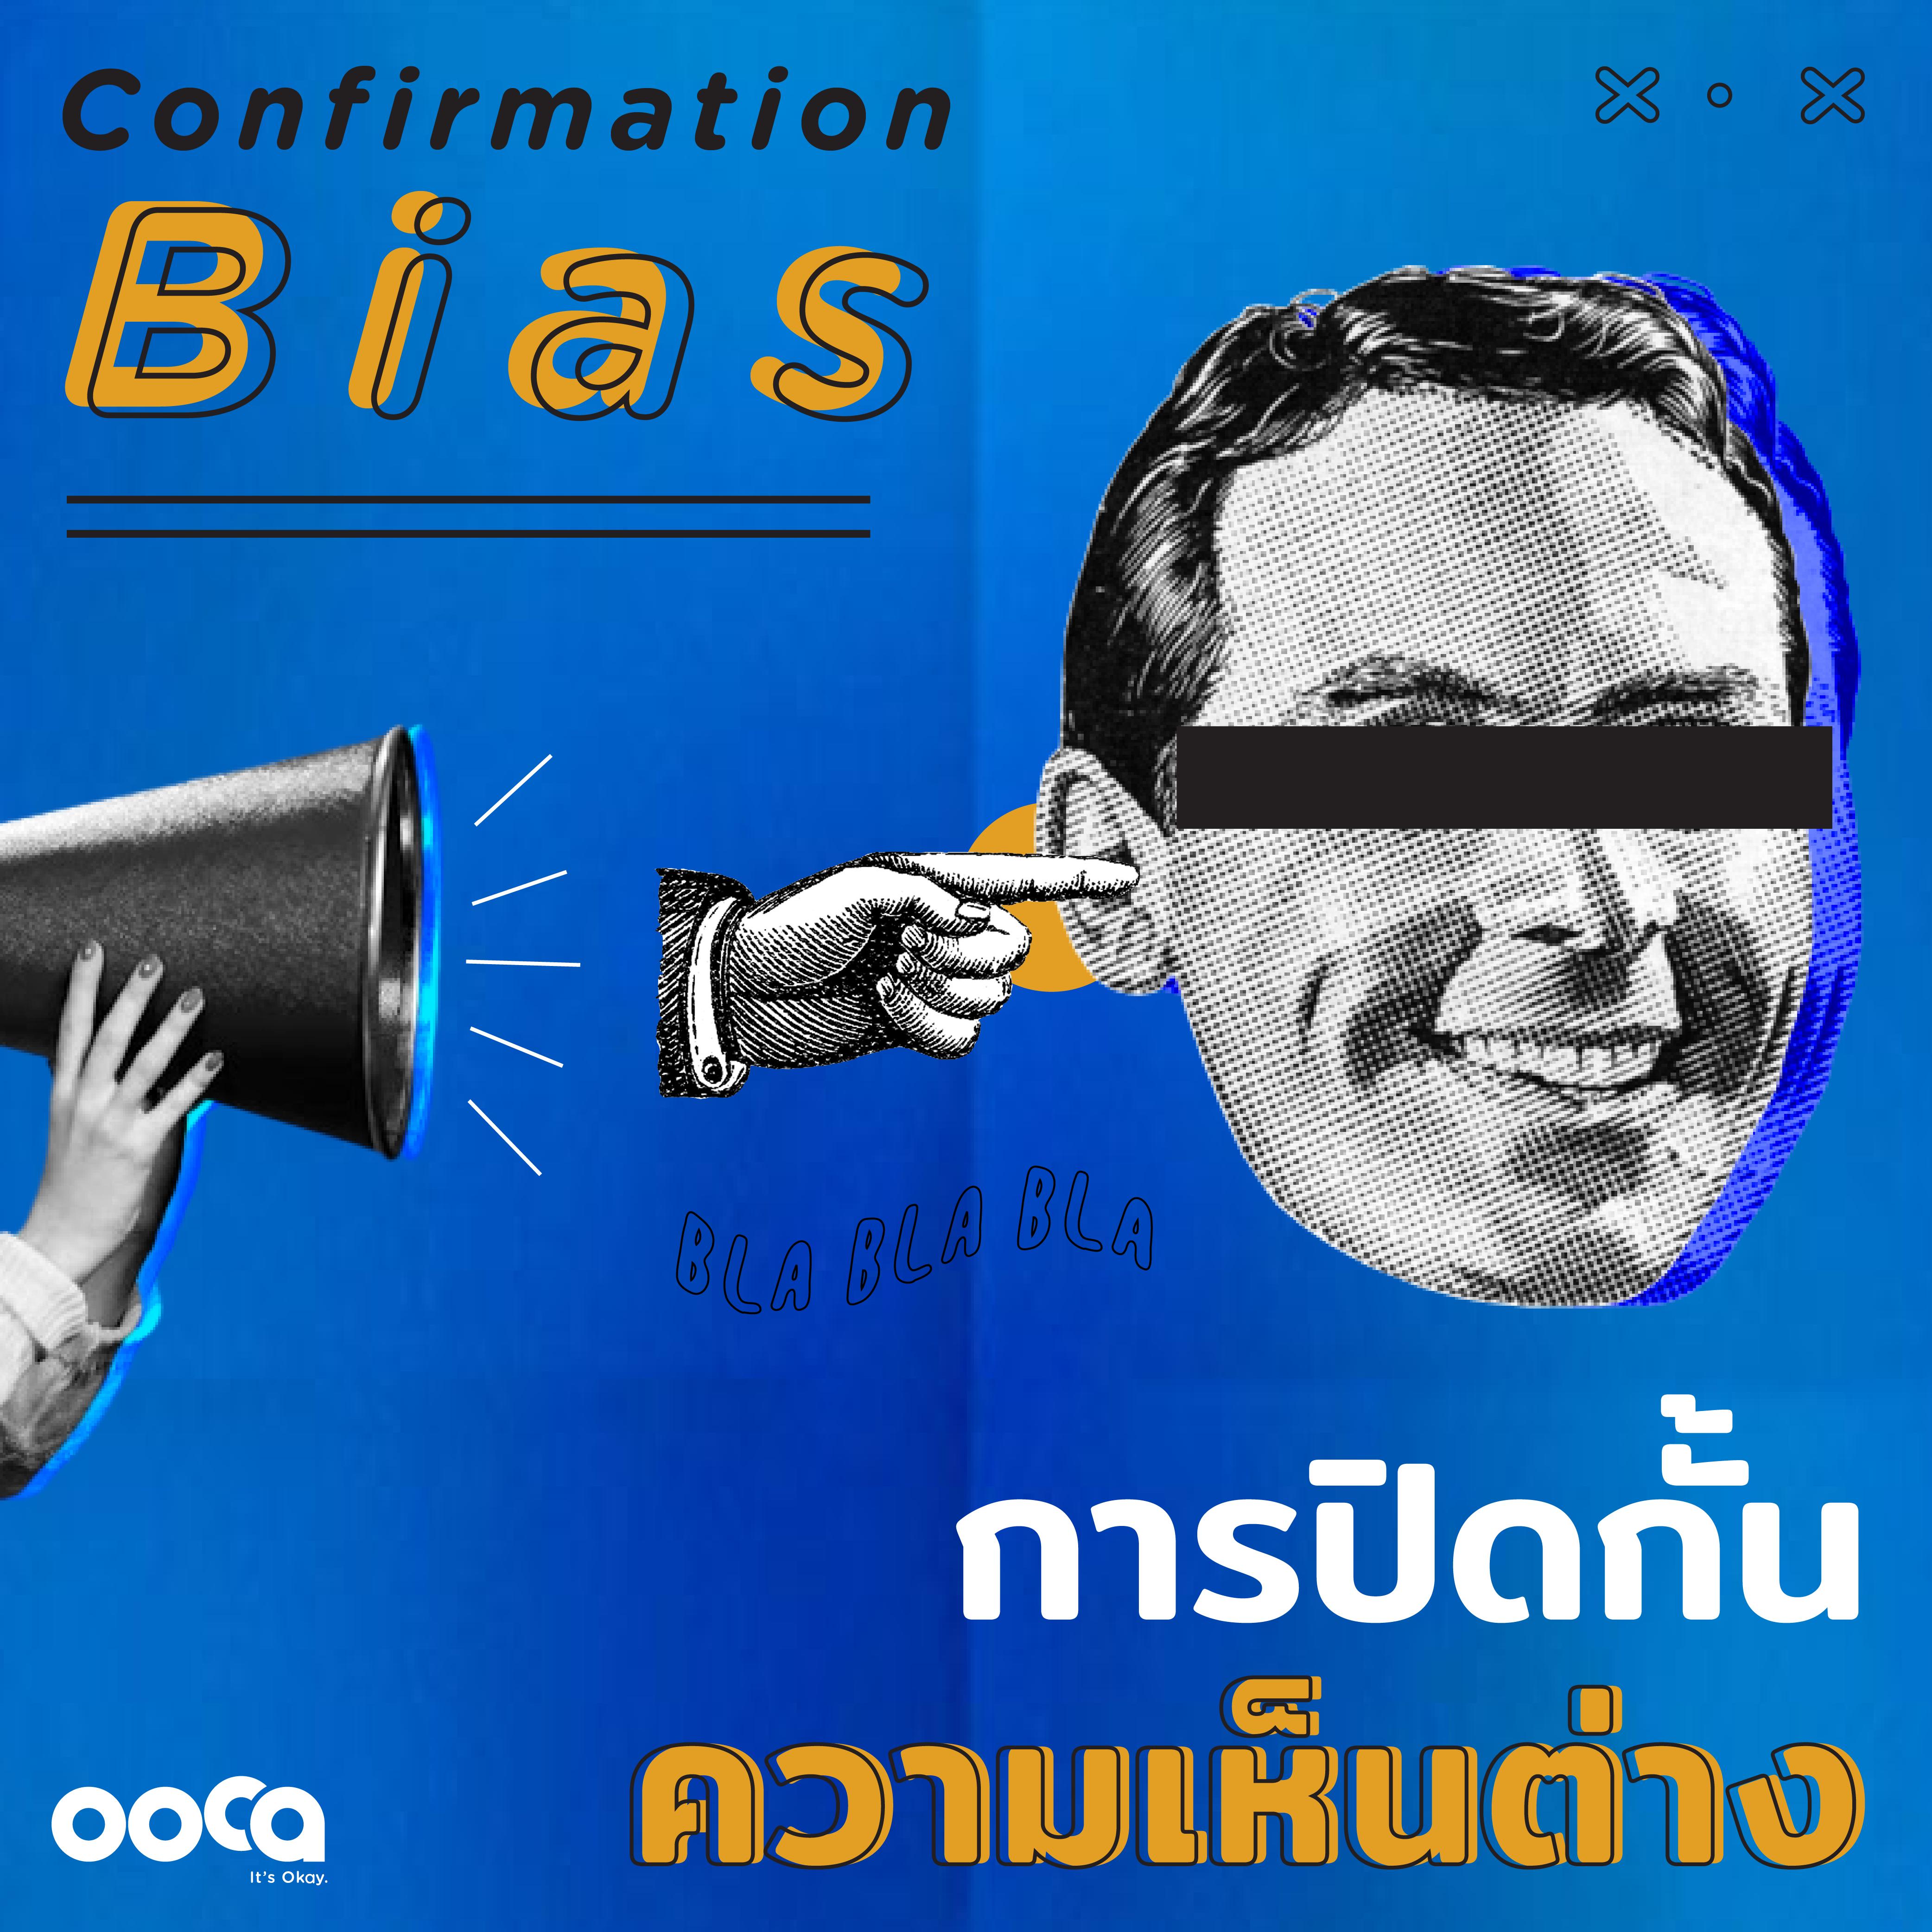 Confirmation Bias การปิดกั้นความเห็นต่าง